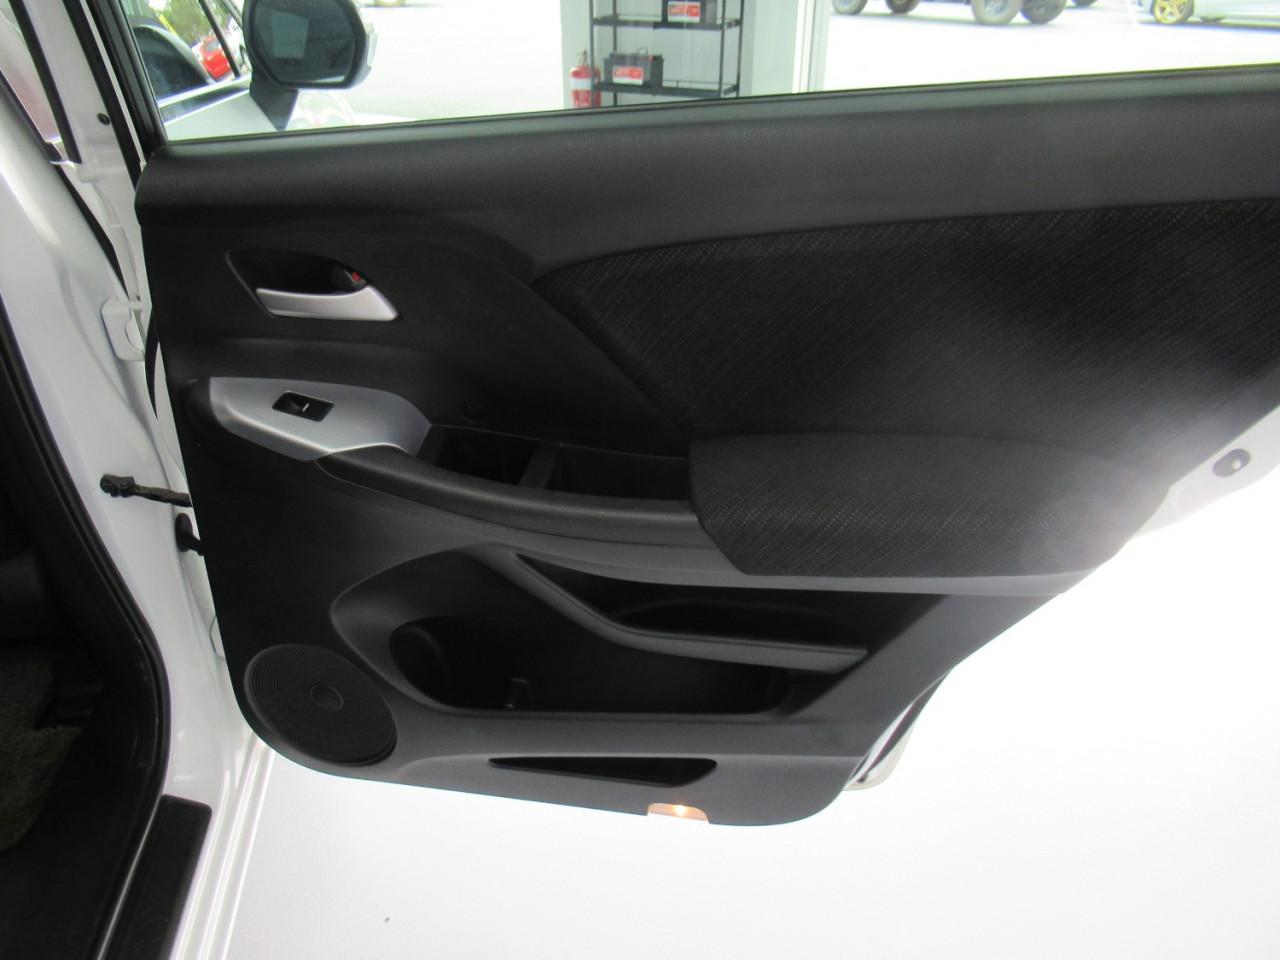 2013 Honda Odyssey 4TH GEN MY13 Wagon Image 27